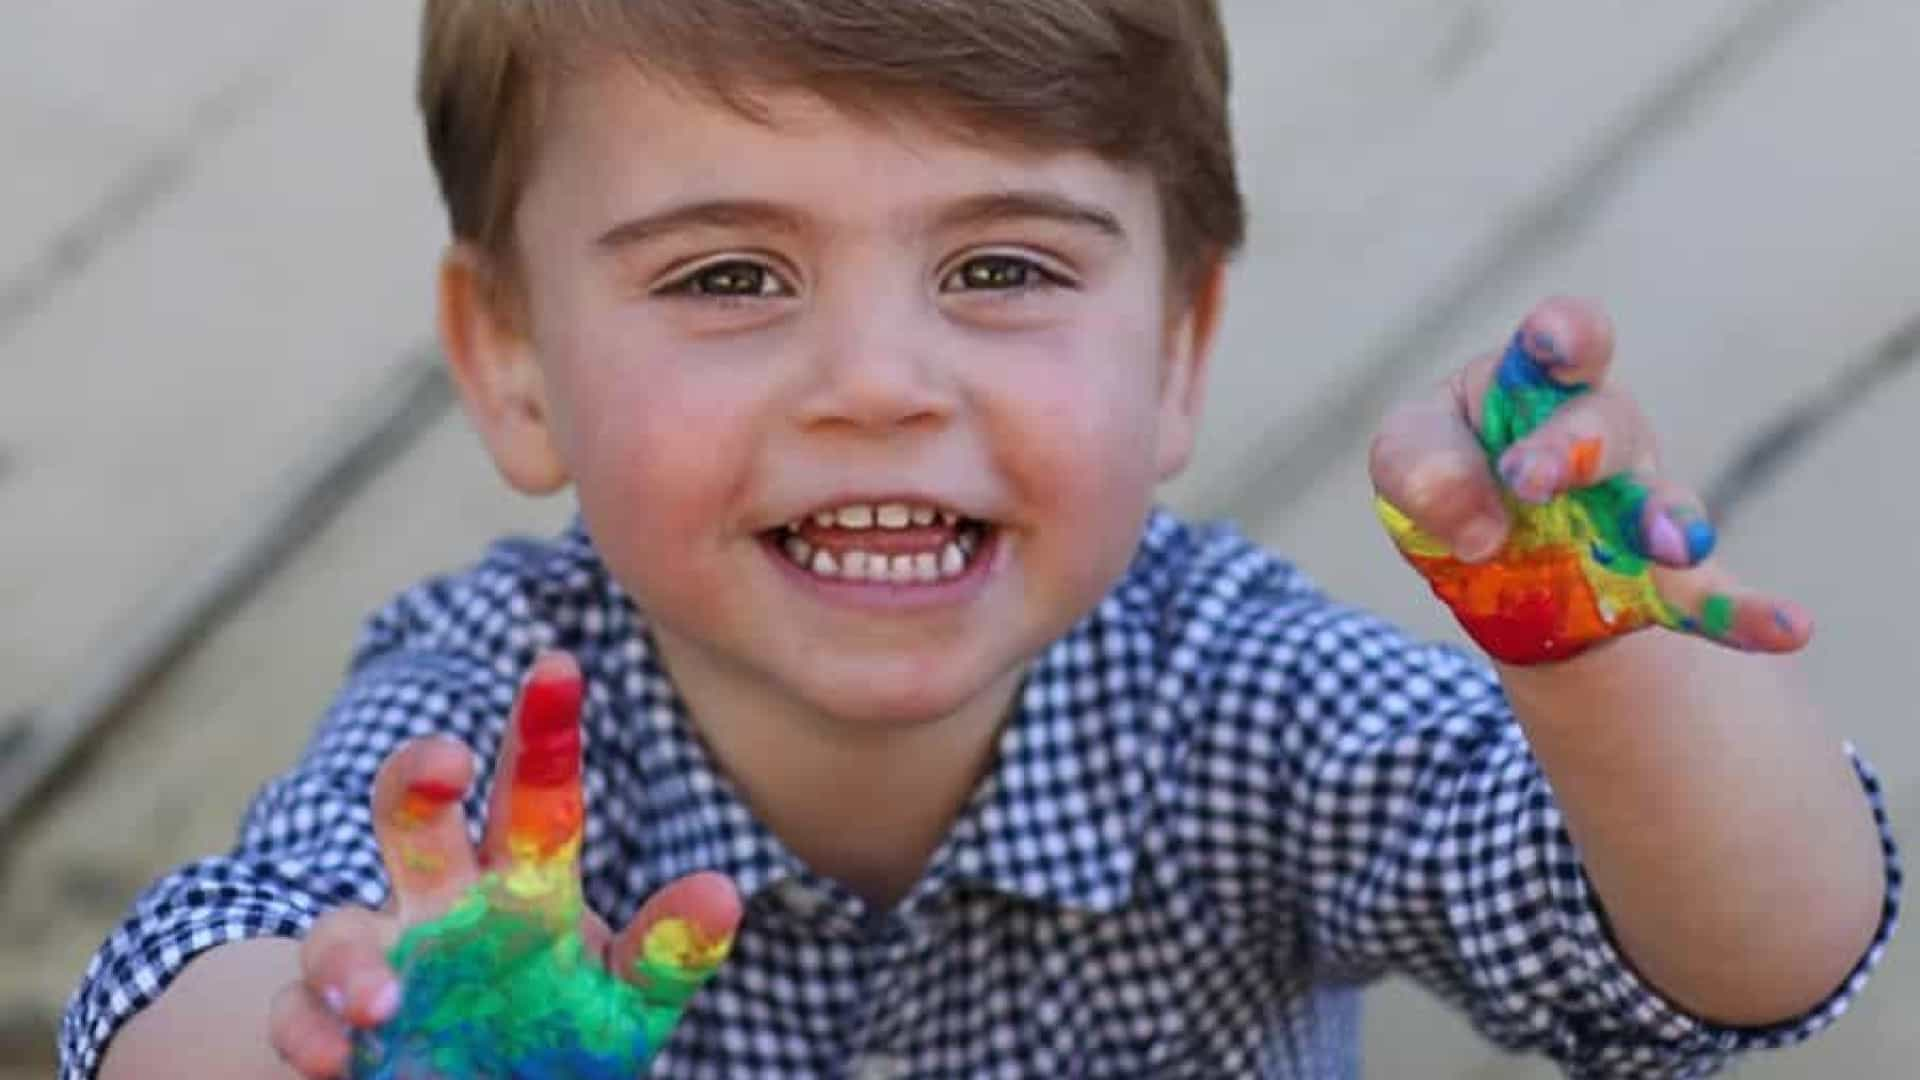 Realeza posta fotos do príncipe Louis para comemorar 2º aniversário